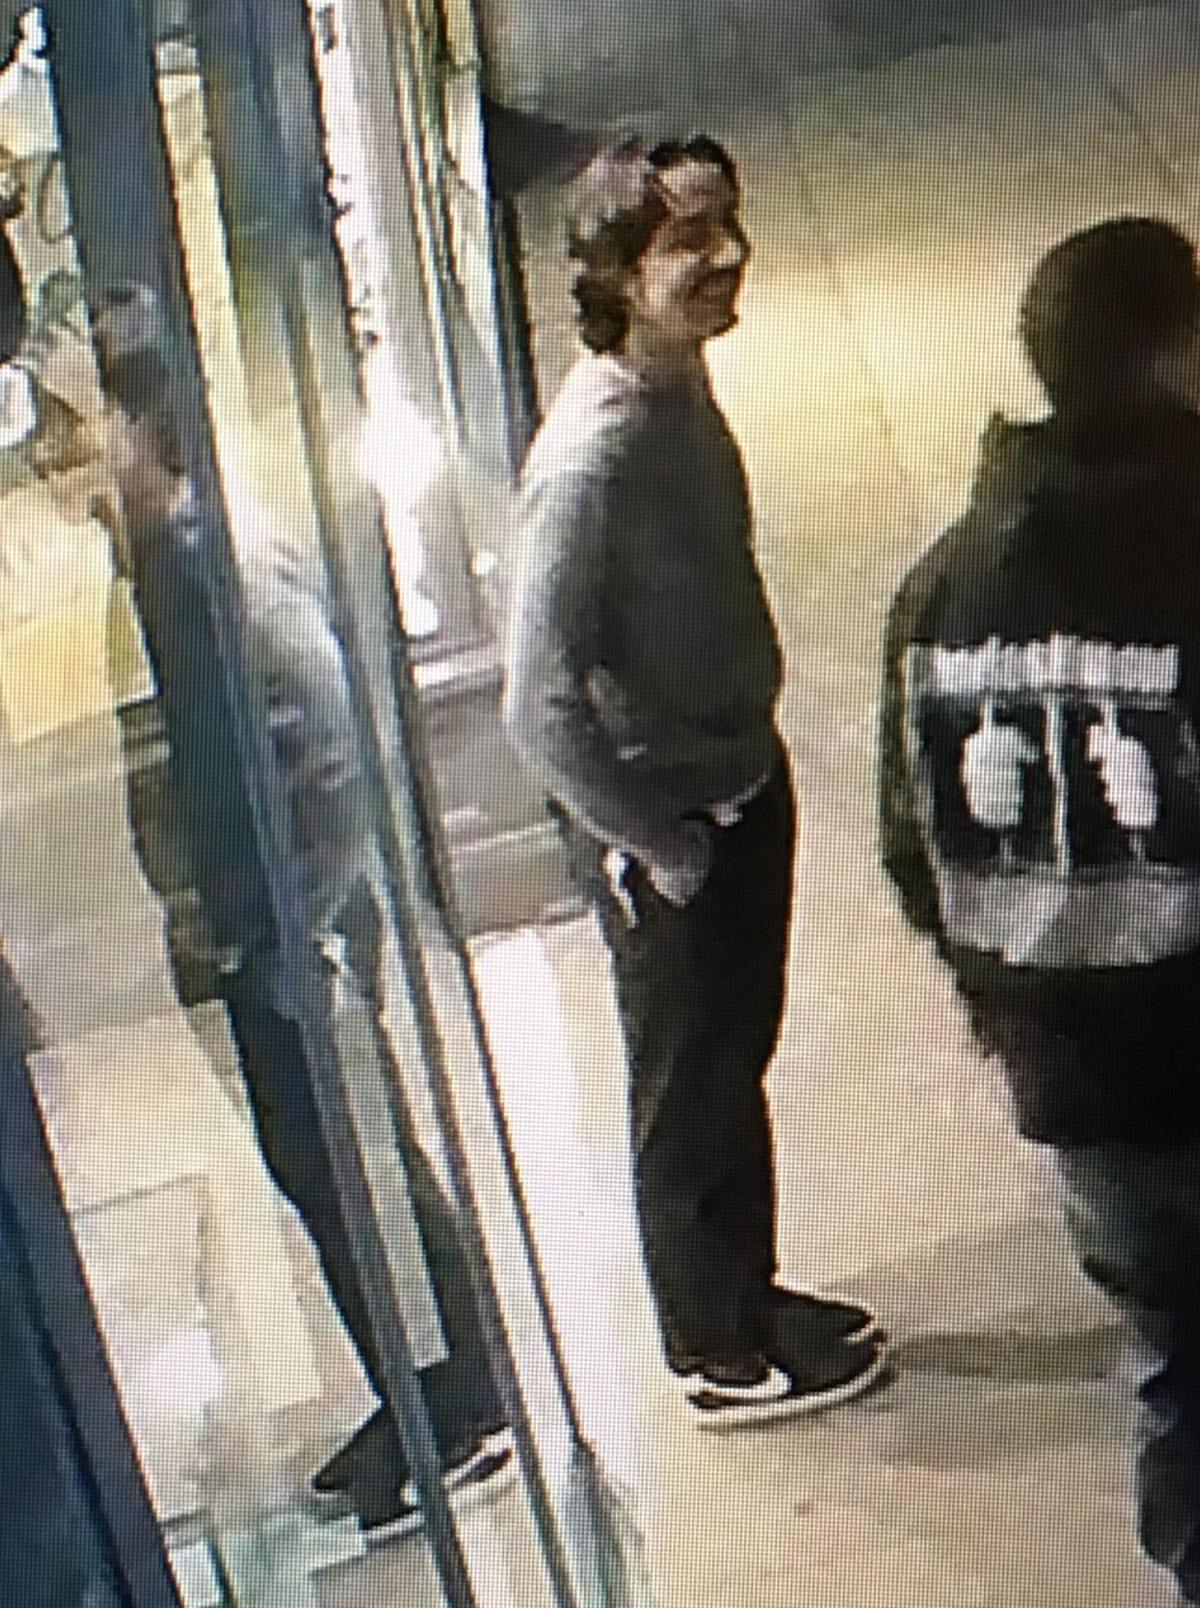 St. Helena police investigation